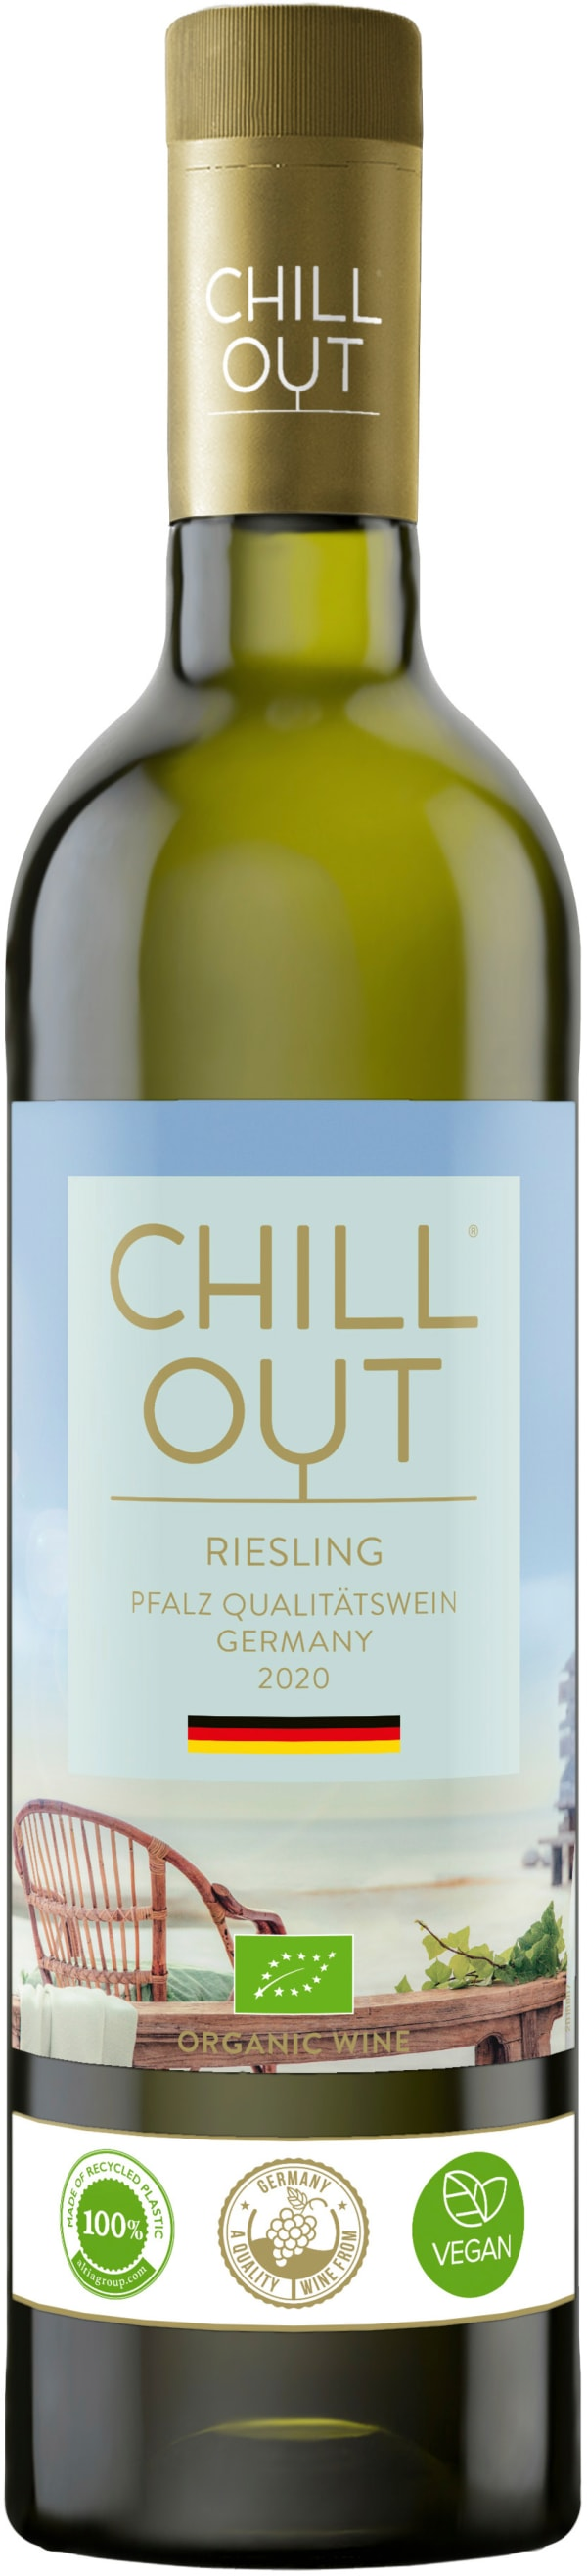 Chill Out Crisp & Fruity Riesling Organic 2016 plastflaska